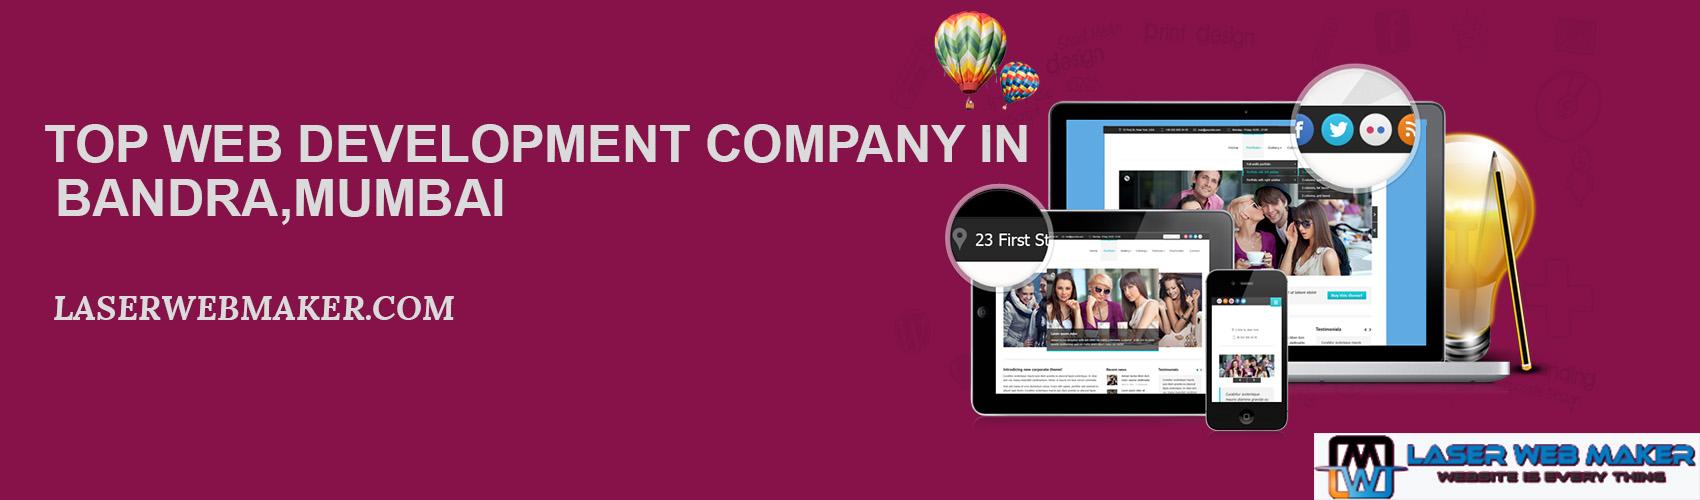 Top Web Development Company In Bandra